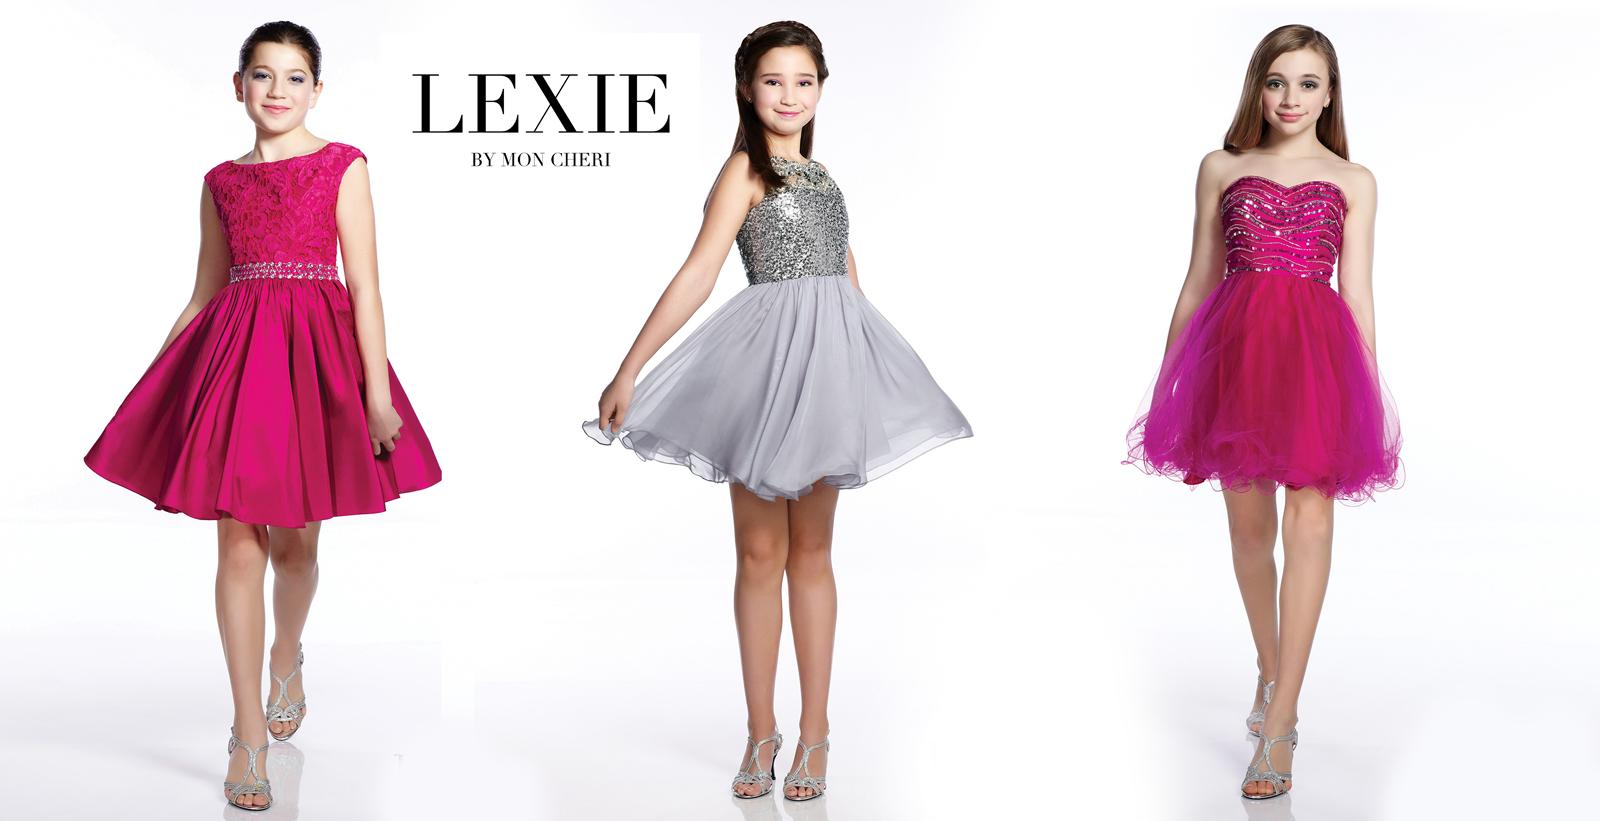 Lexie by Mon Cheri